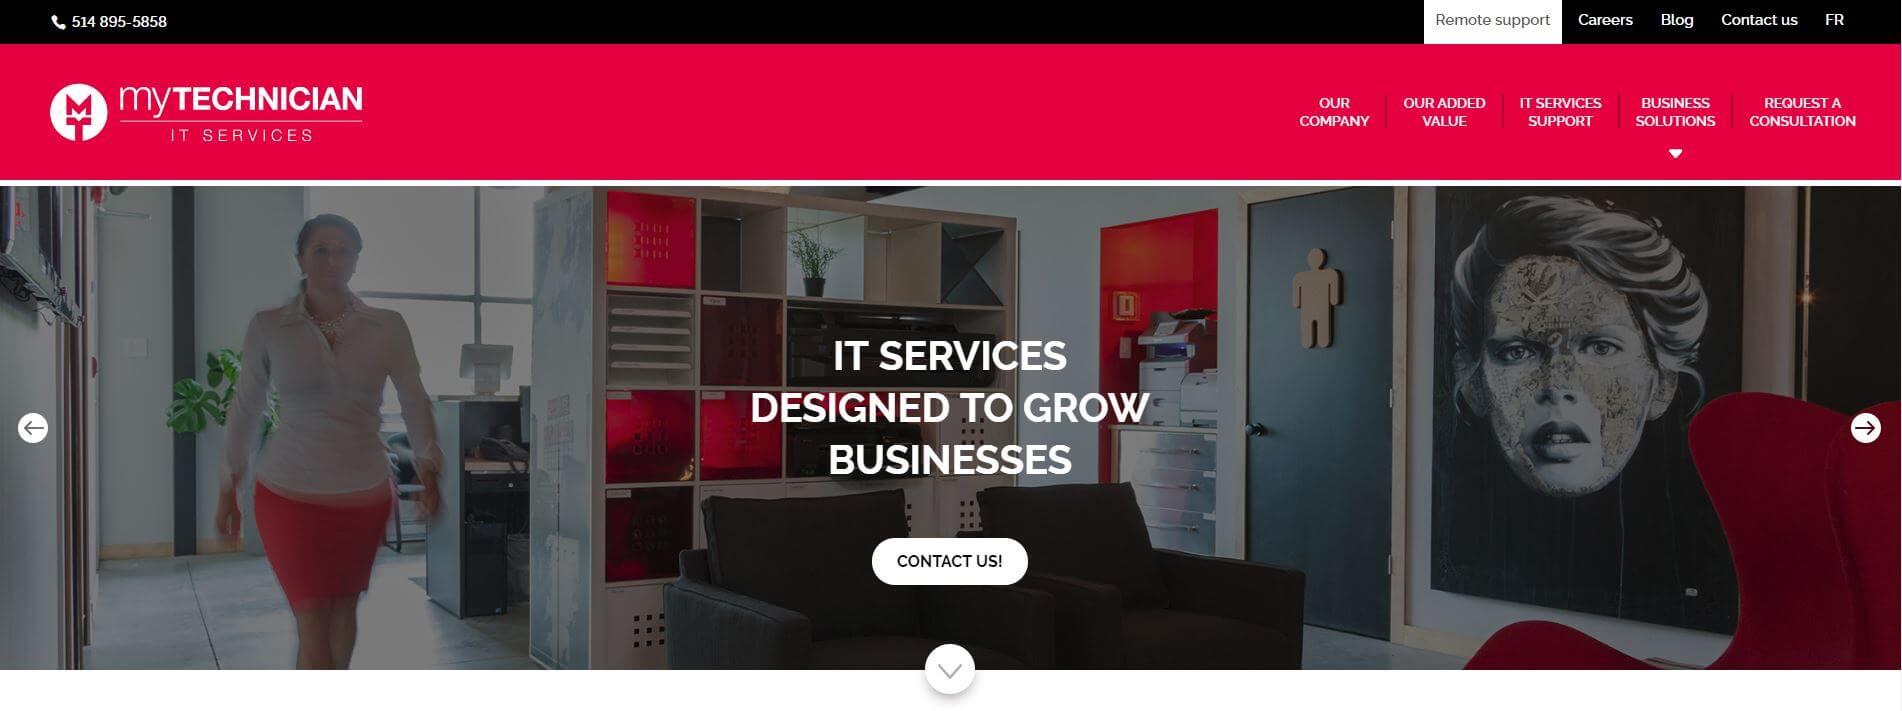 The new My Technician website is online!